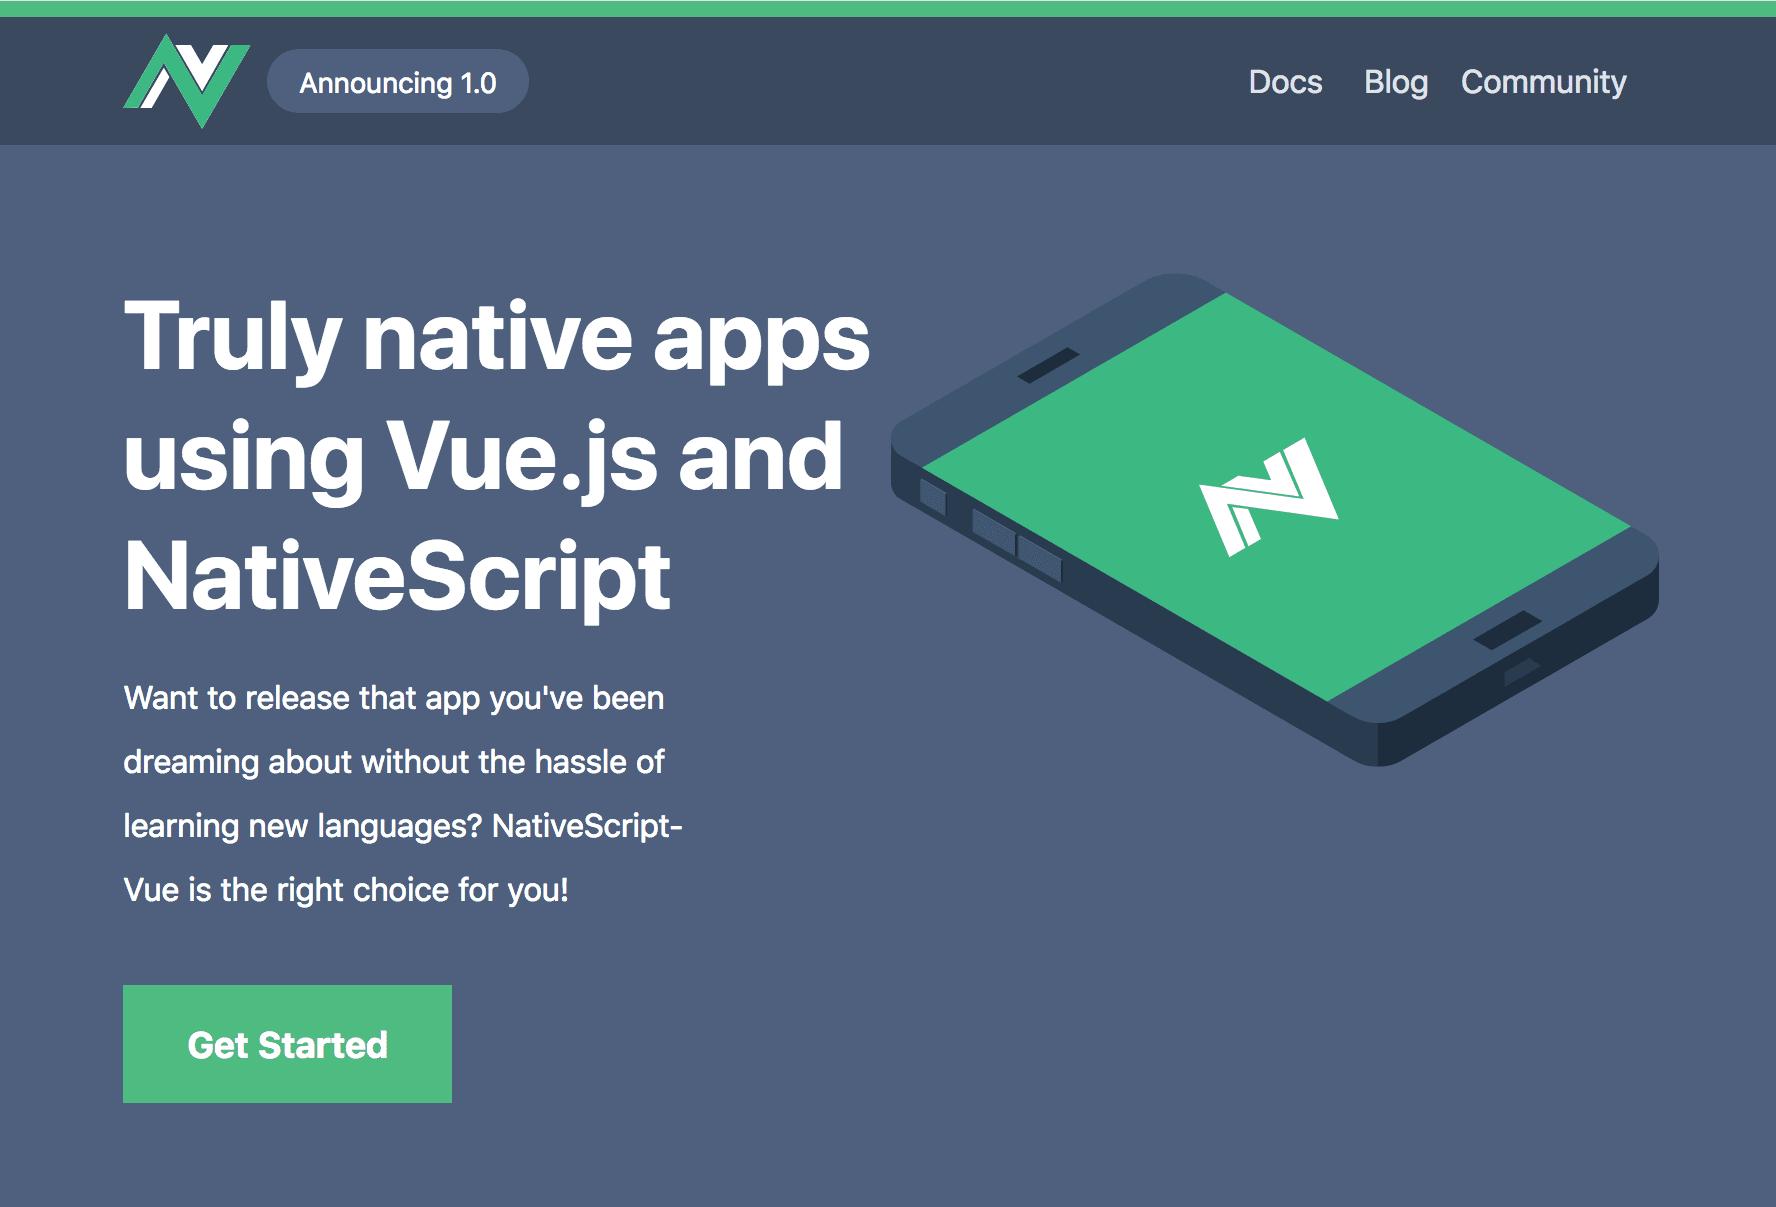 NativeScript-Vue 1.0